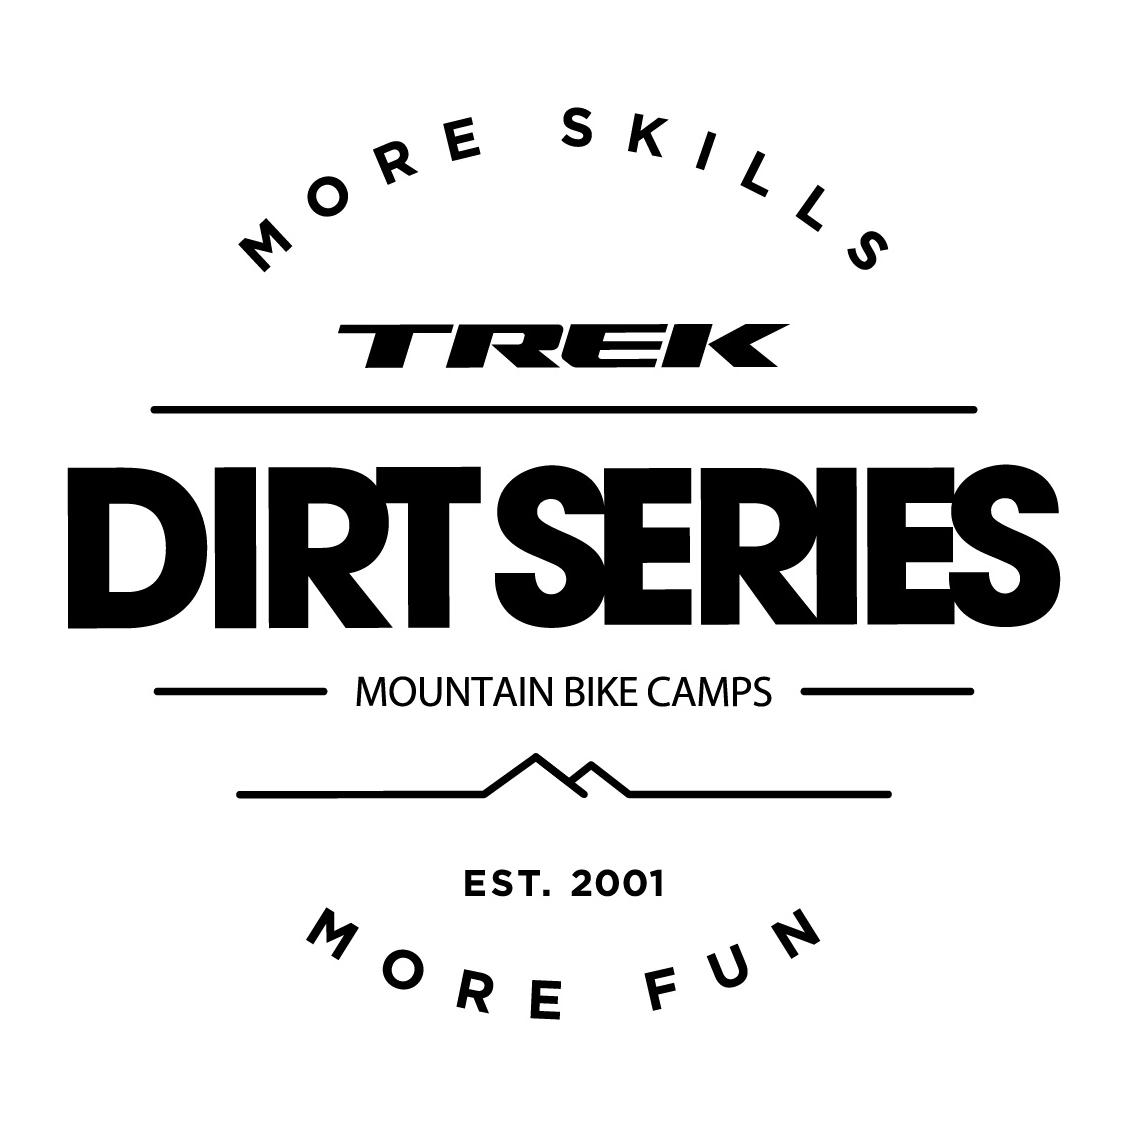 Dirt Series Mountain Bike Camp (co-ed) - Santa Cruz, CA